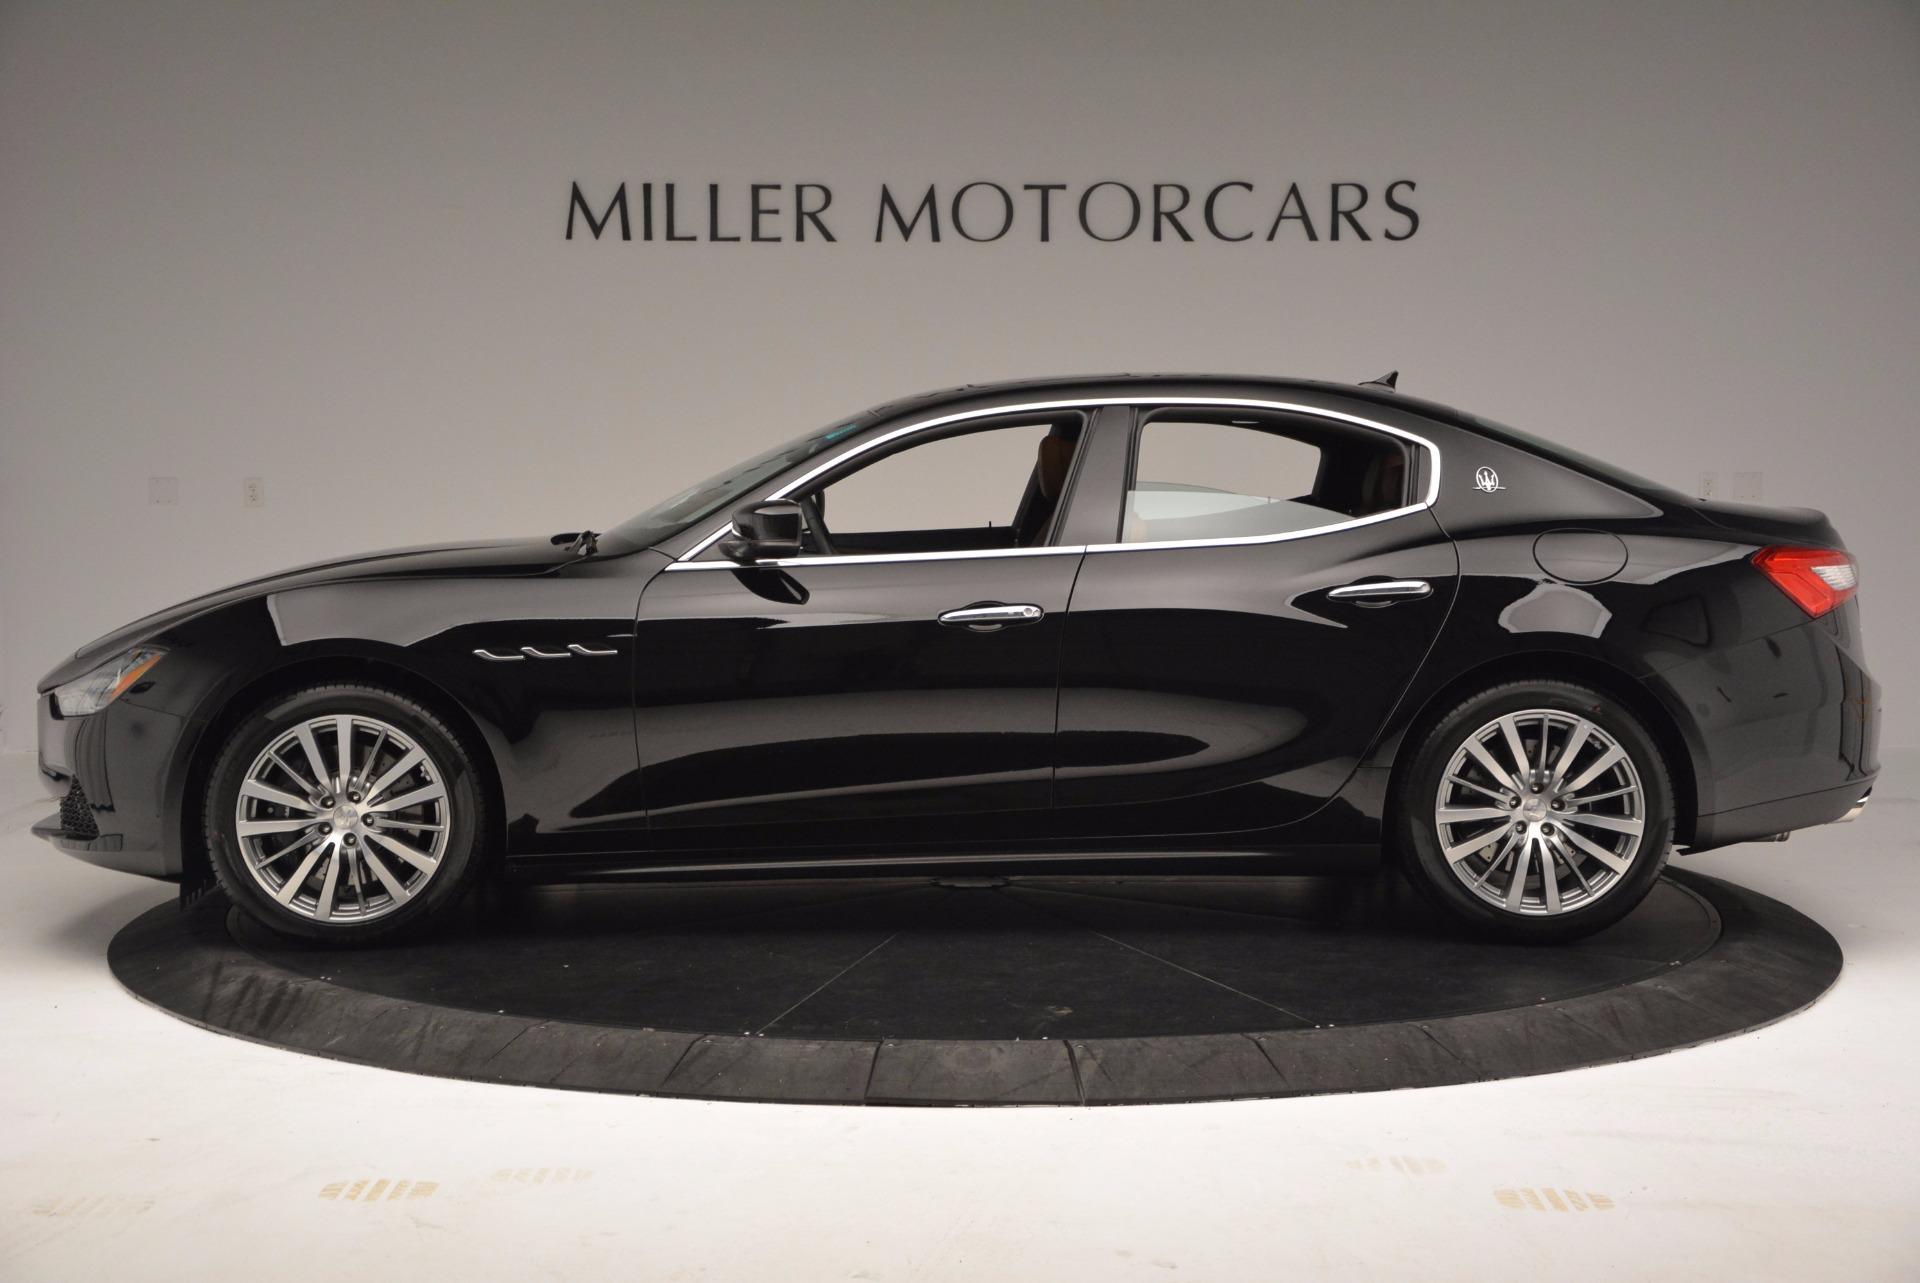 Used 2017 Maserati Ghibli S Q4 EX-Loaner For Sale In Greenwich, CT 776_p3